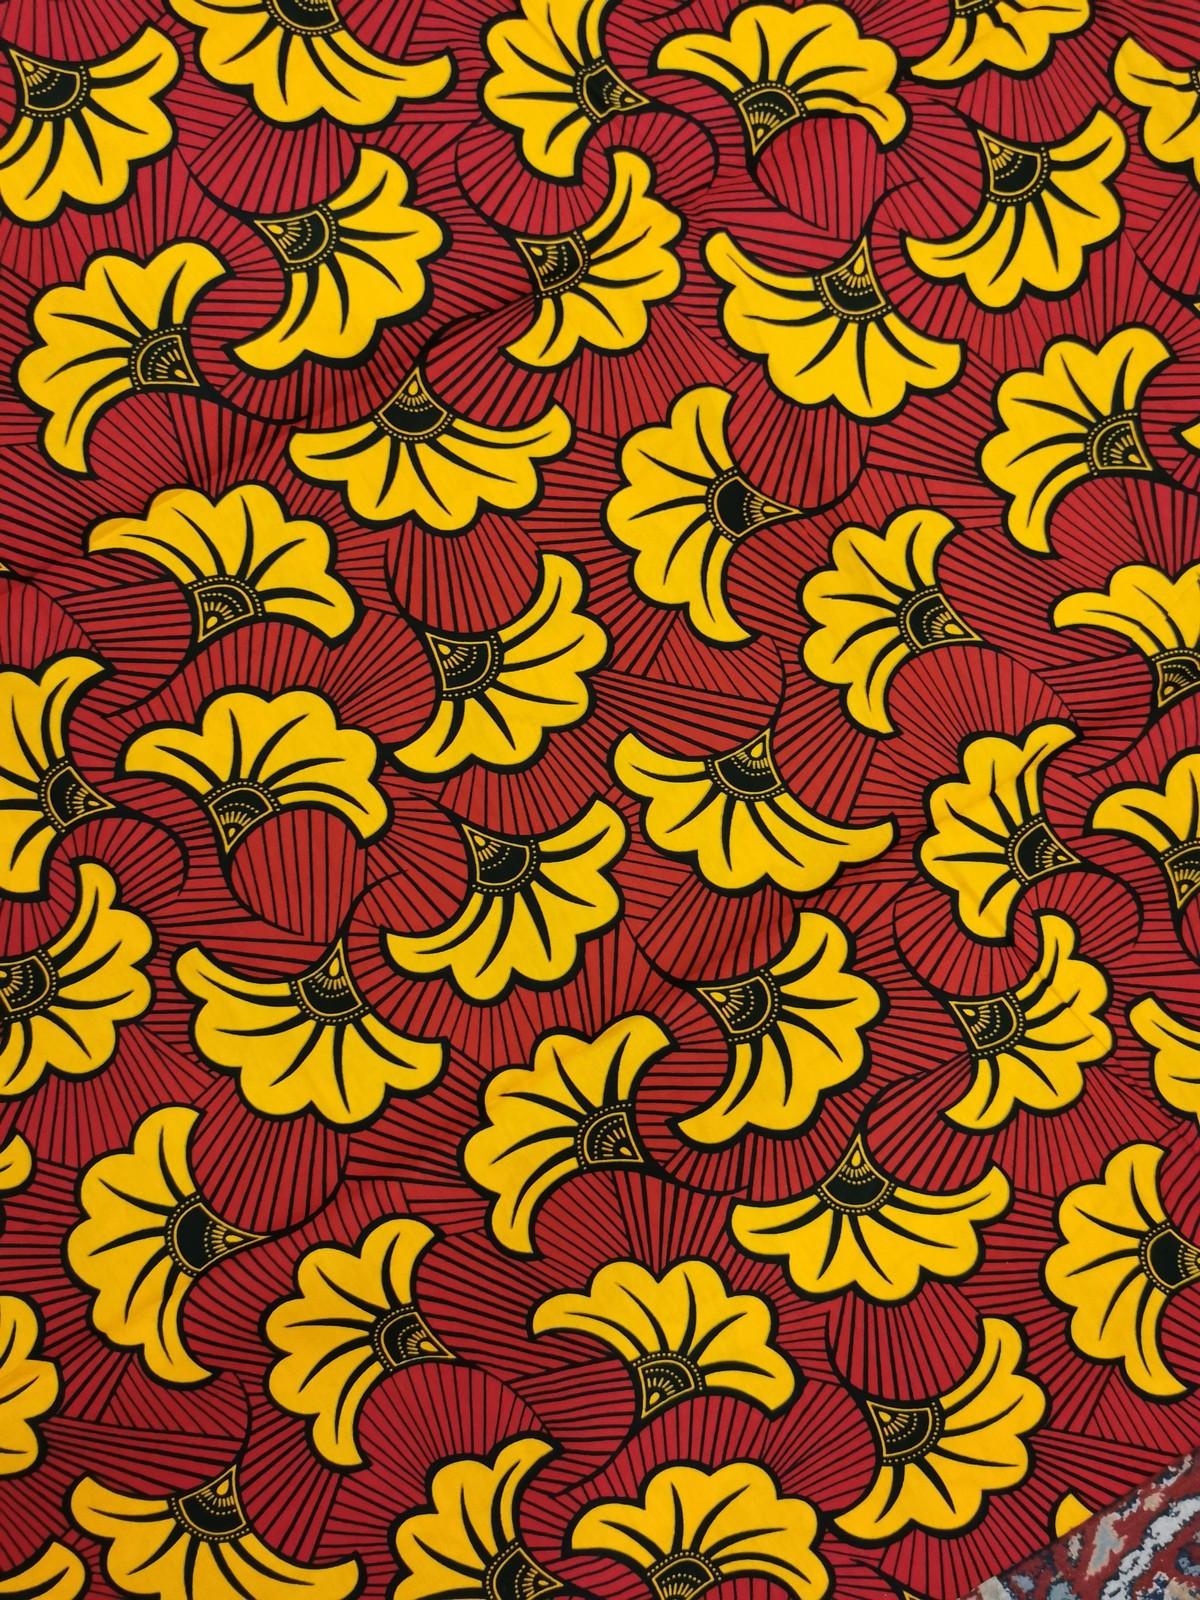 coupon cloth 45 cm x 115 cm Ankara african wax fabric